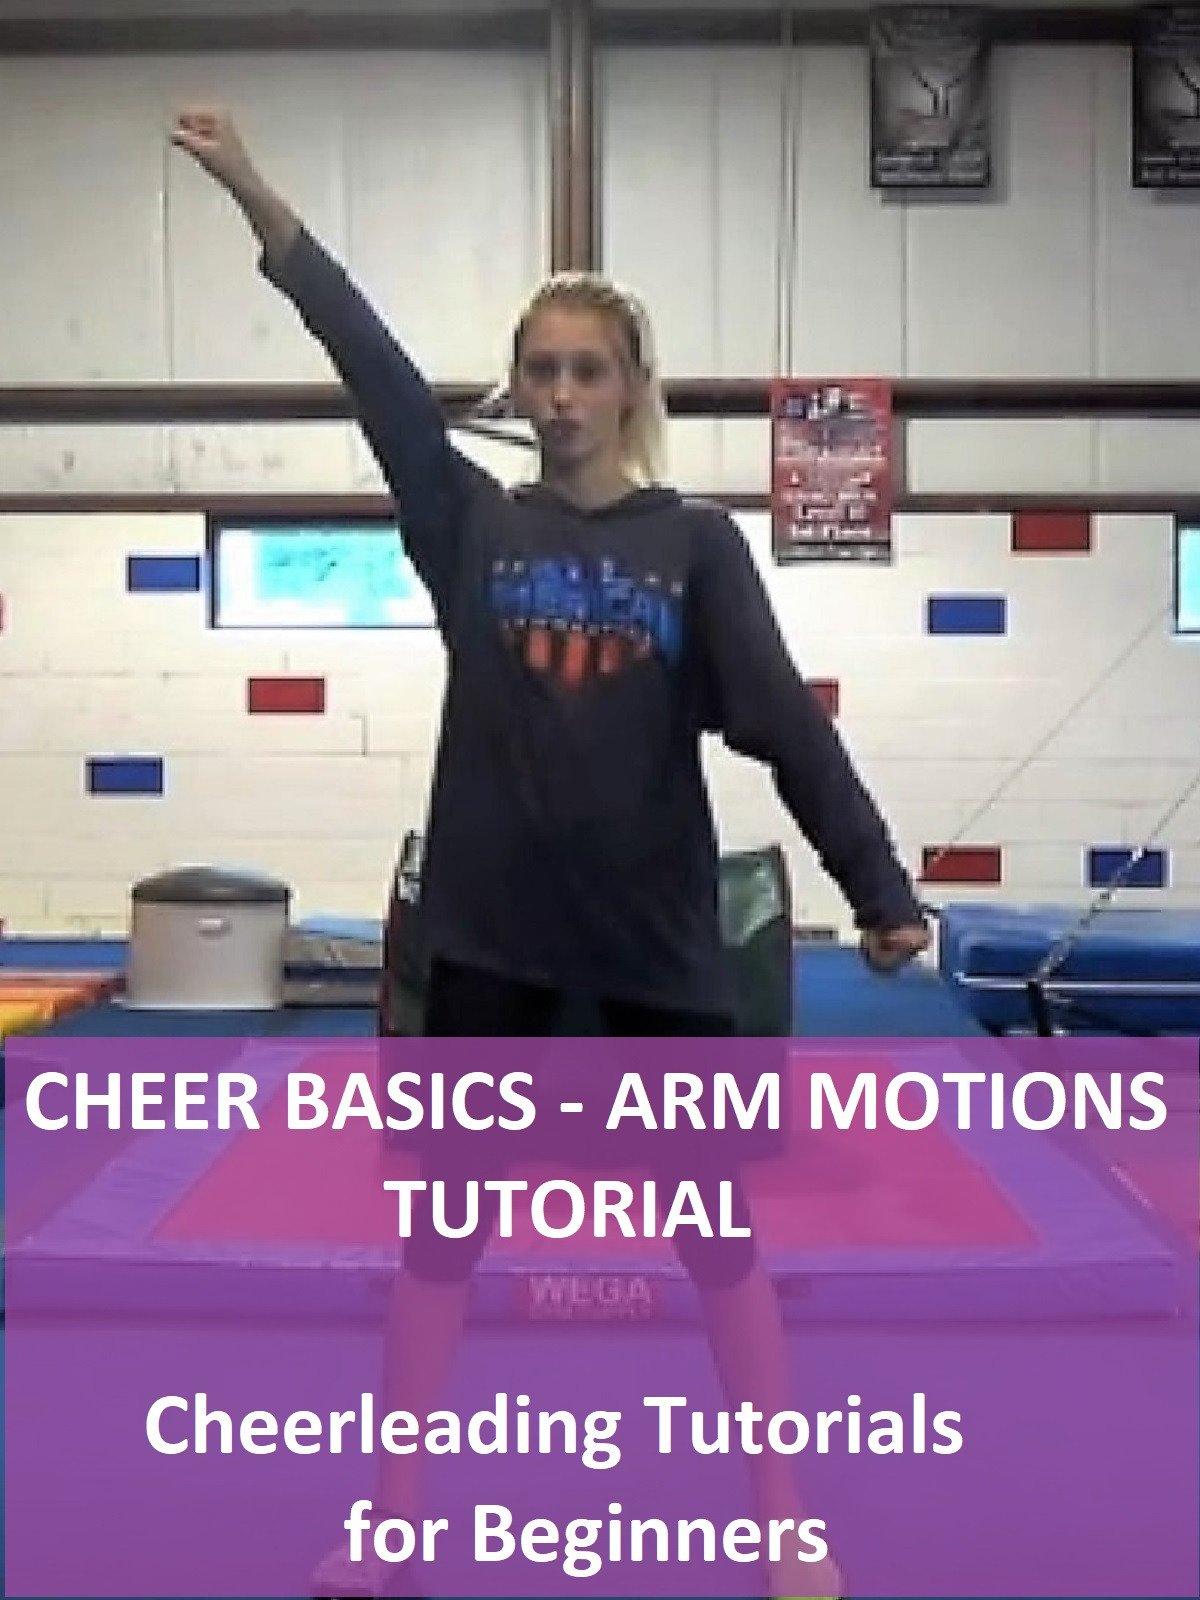 Cheer Basics: Arm Motions Tutorial